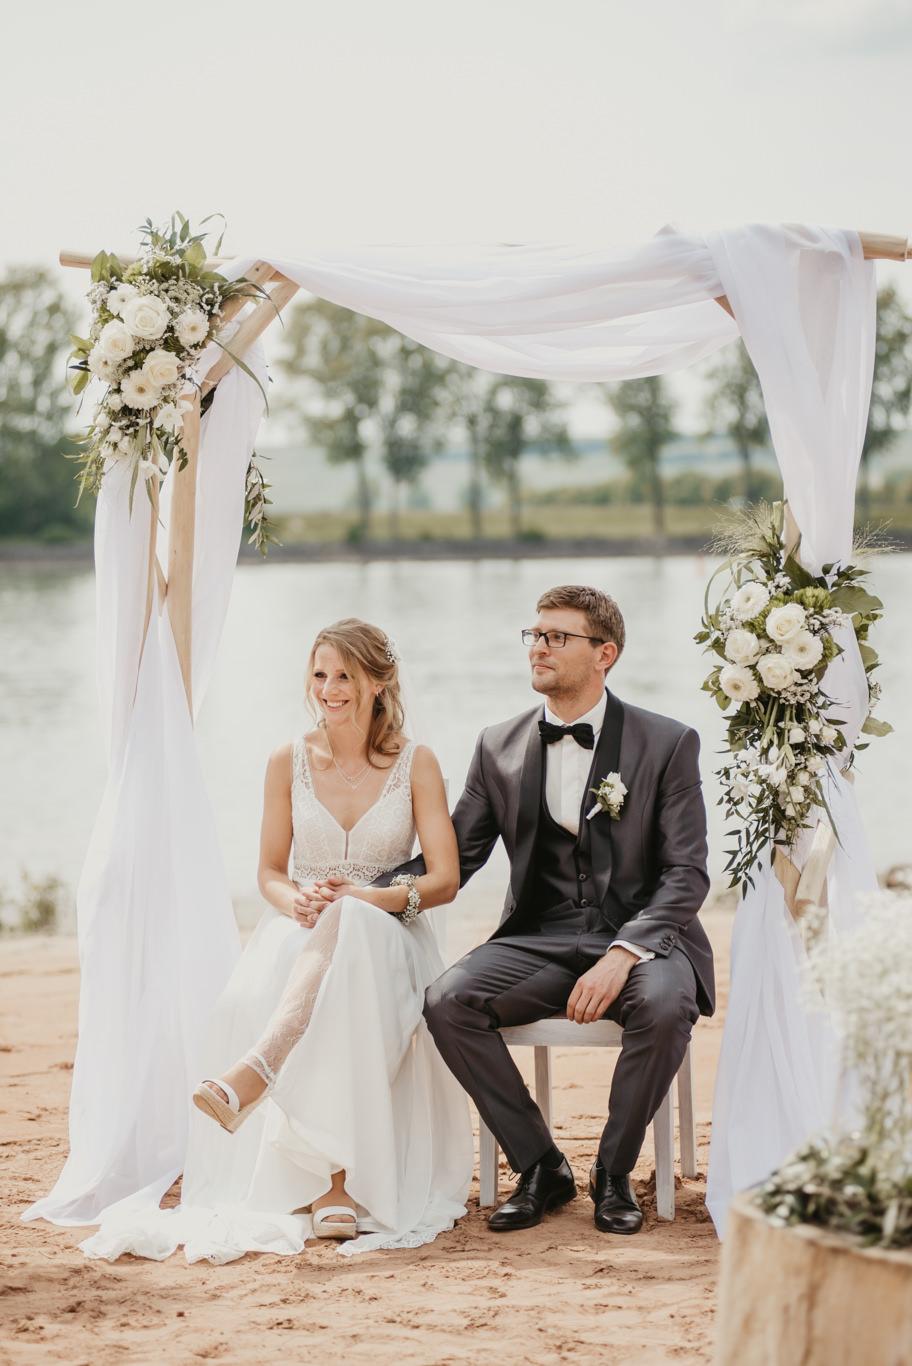 Boho Hochzeit Hofgut Langenau Hochzeitsfotograf